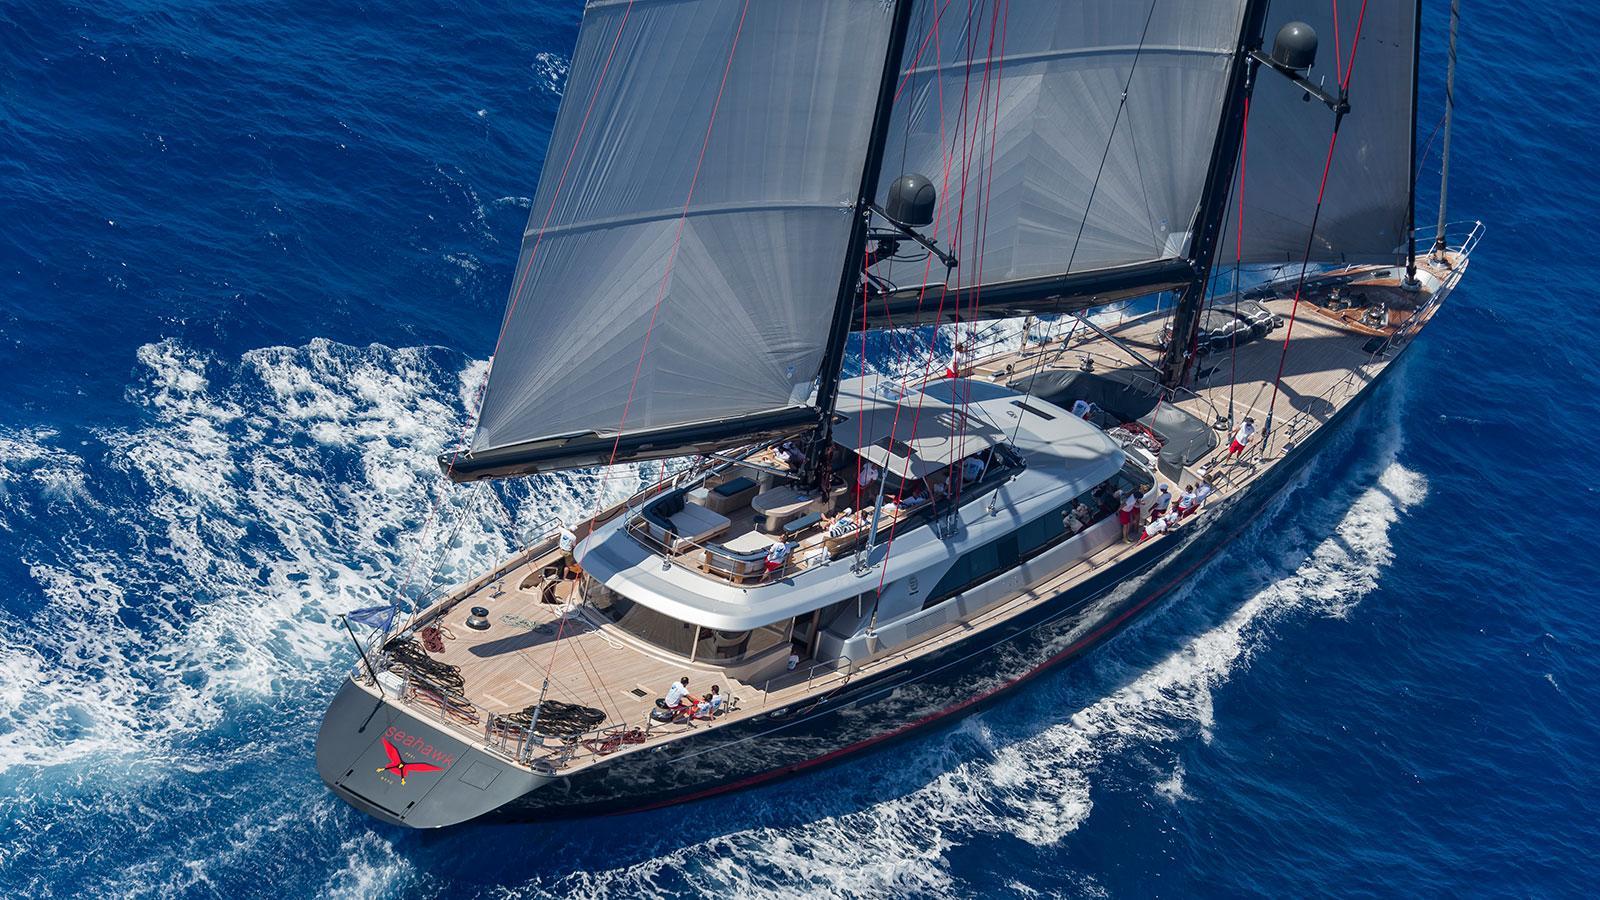 seahawk-super-yacht-sailing-boat